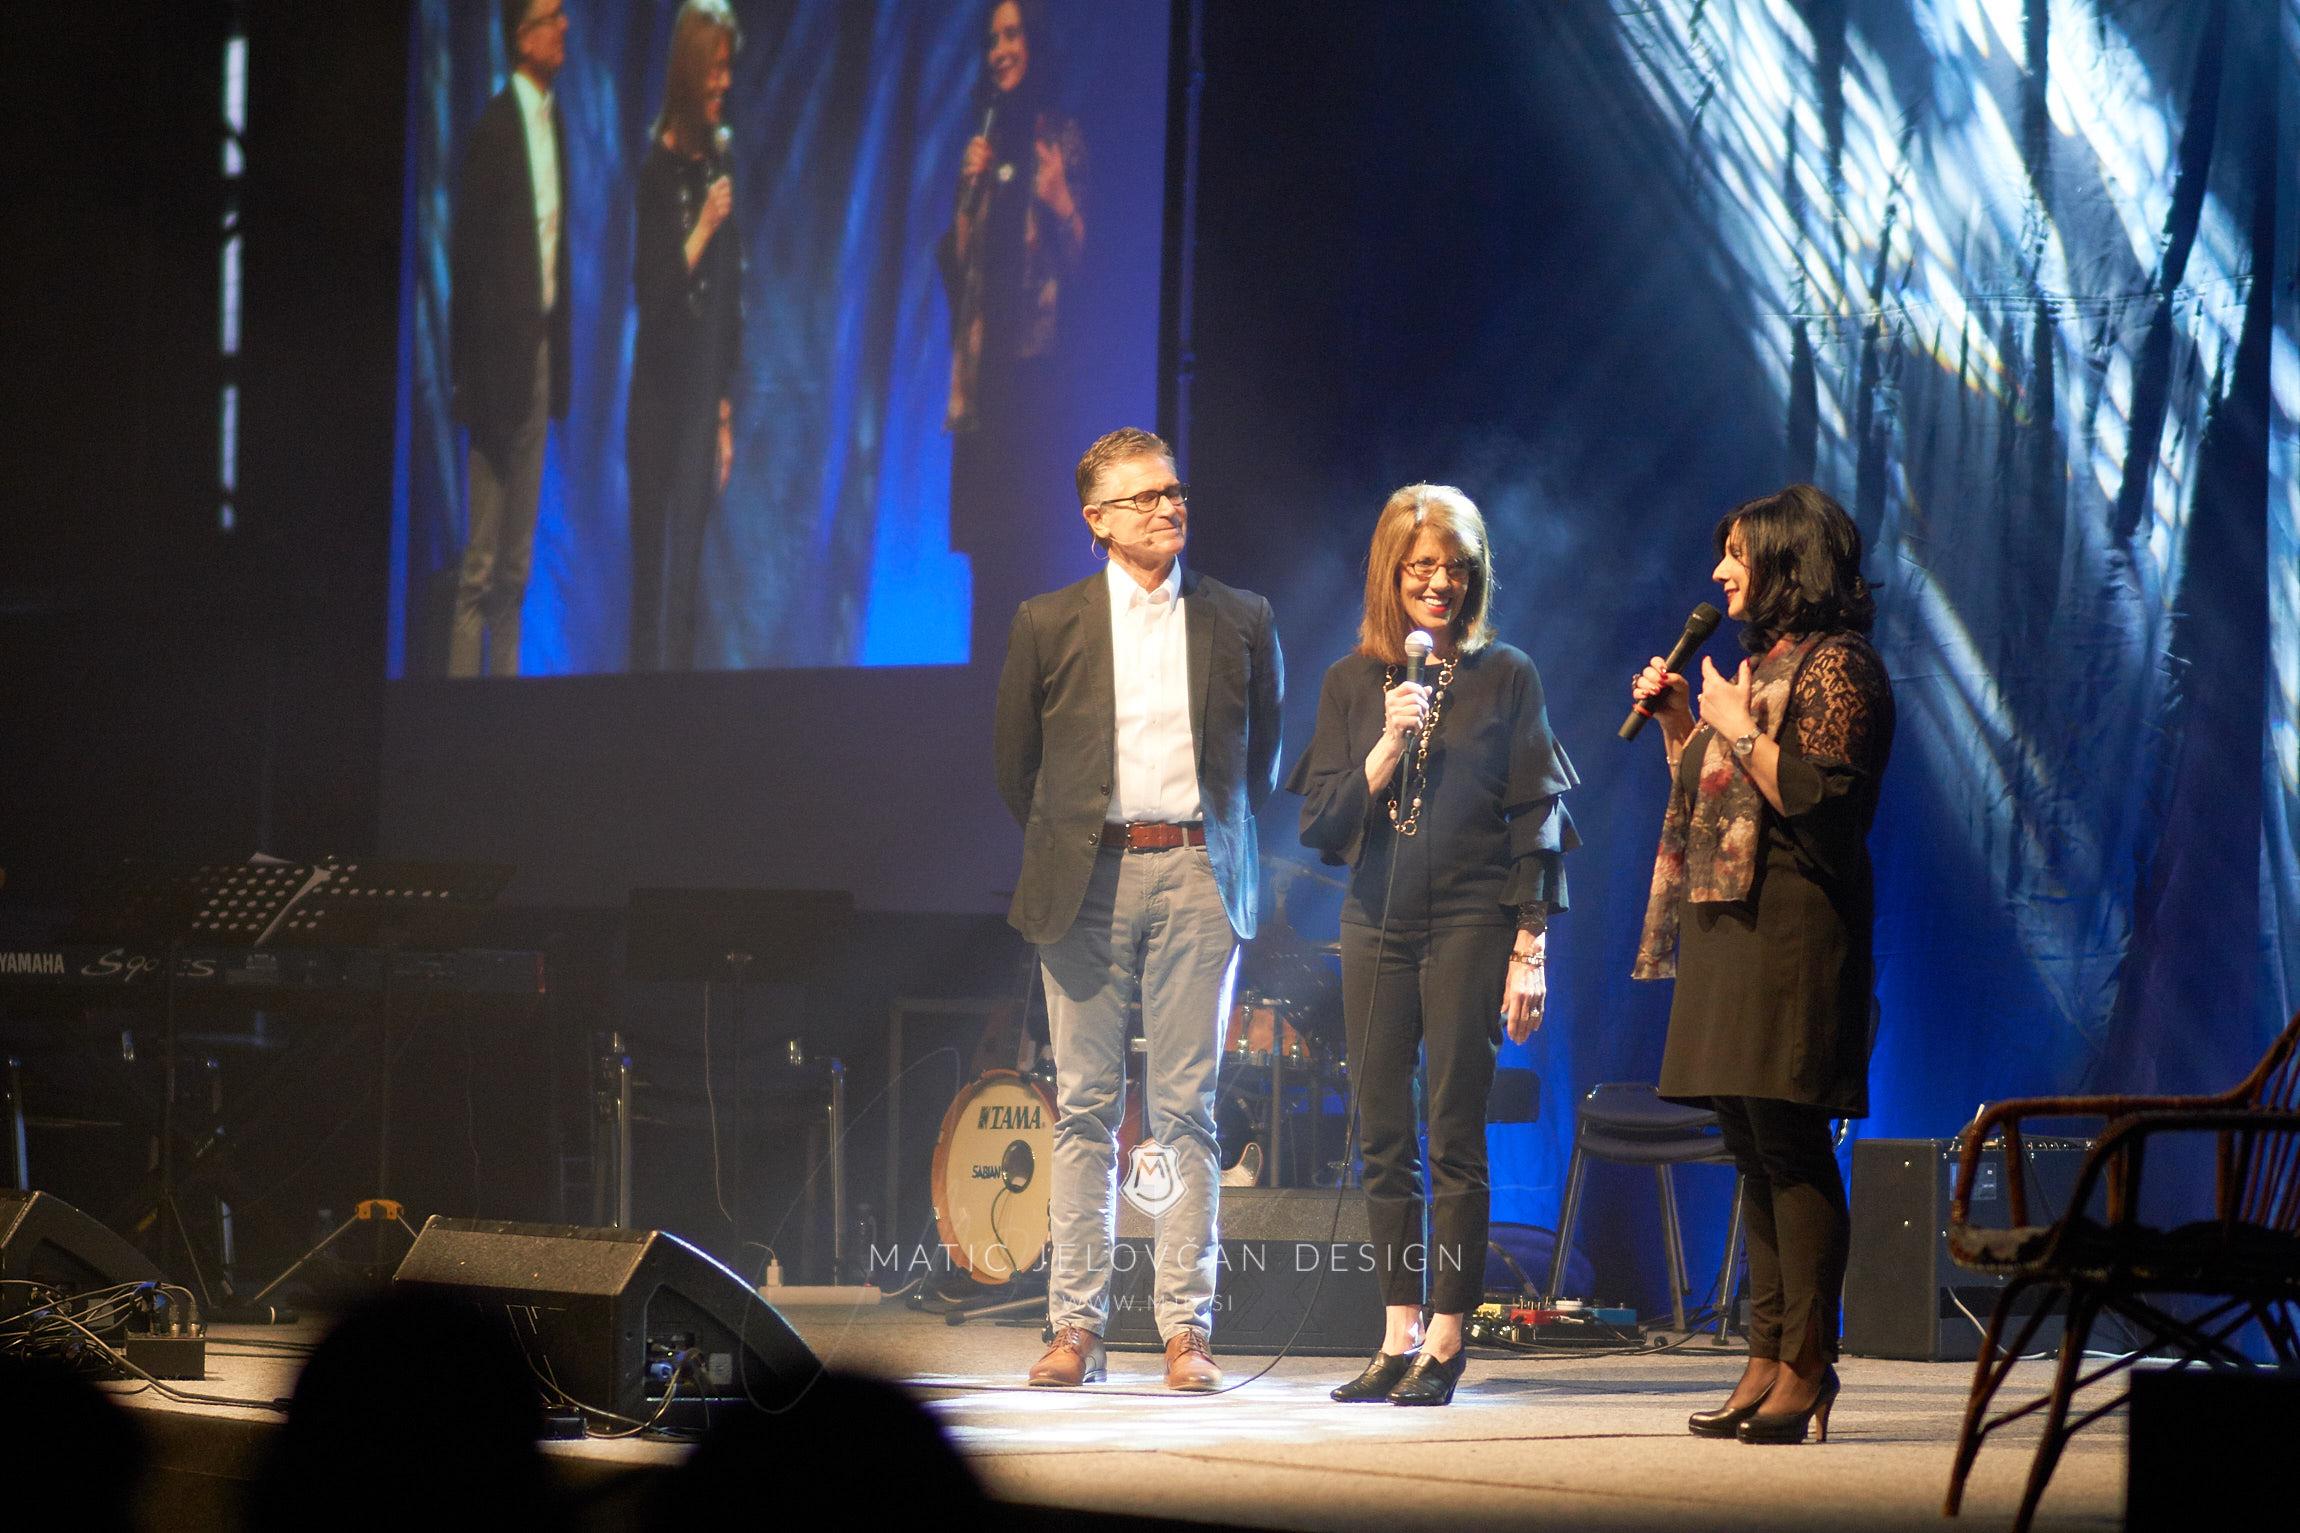 "2018 03 25 19.31.49DSC03640 web1600psSmall 1 - ""Love and Respect"" event in Ljubljana, 2018"